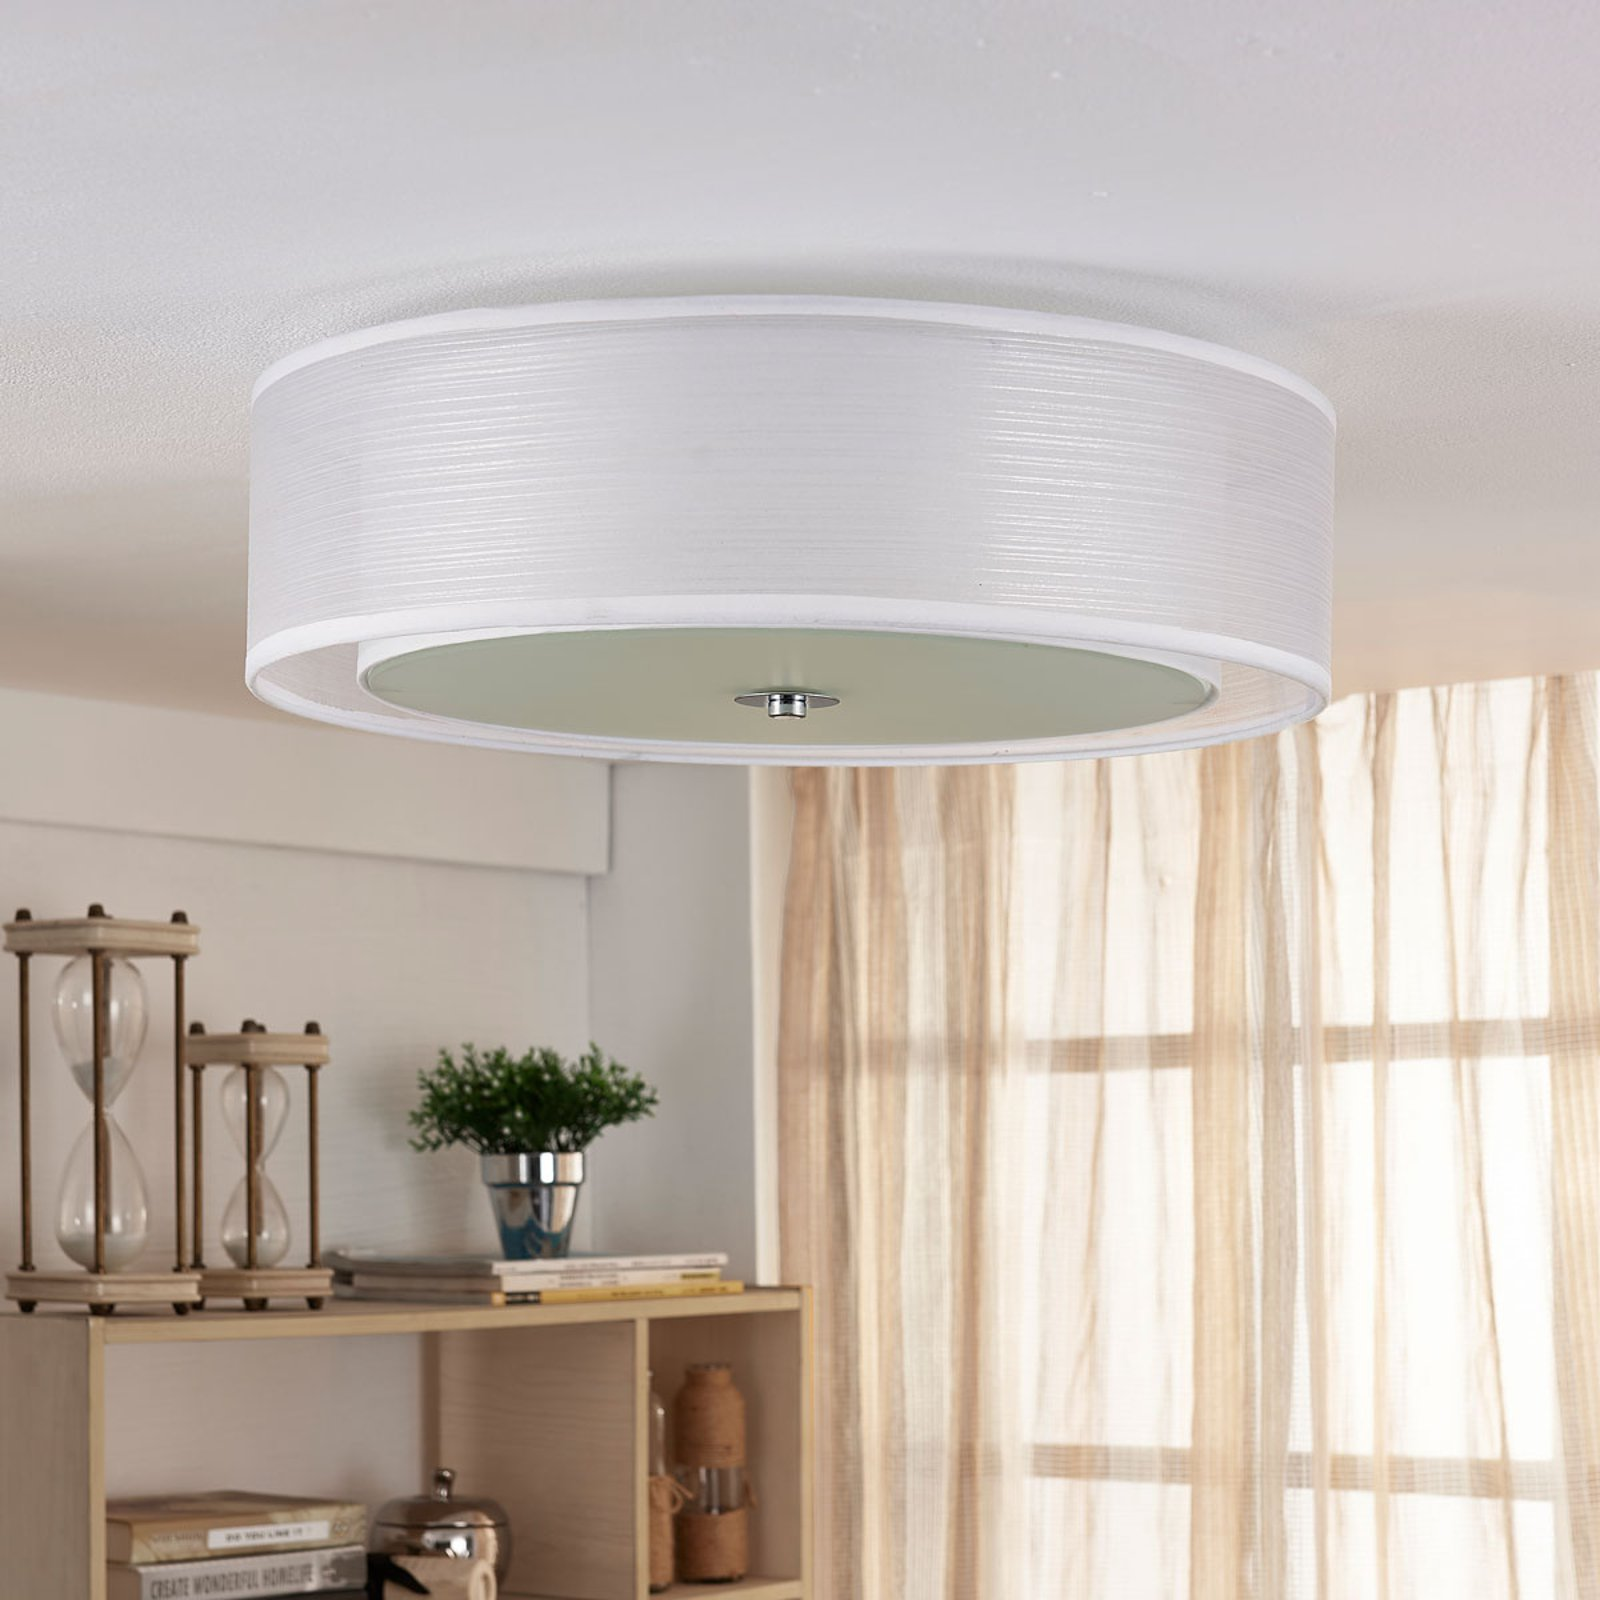 Tobia - hvit LED-taklampe i tekstil, med easydim